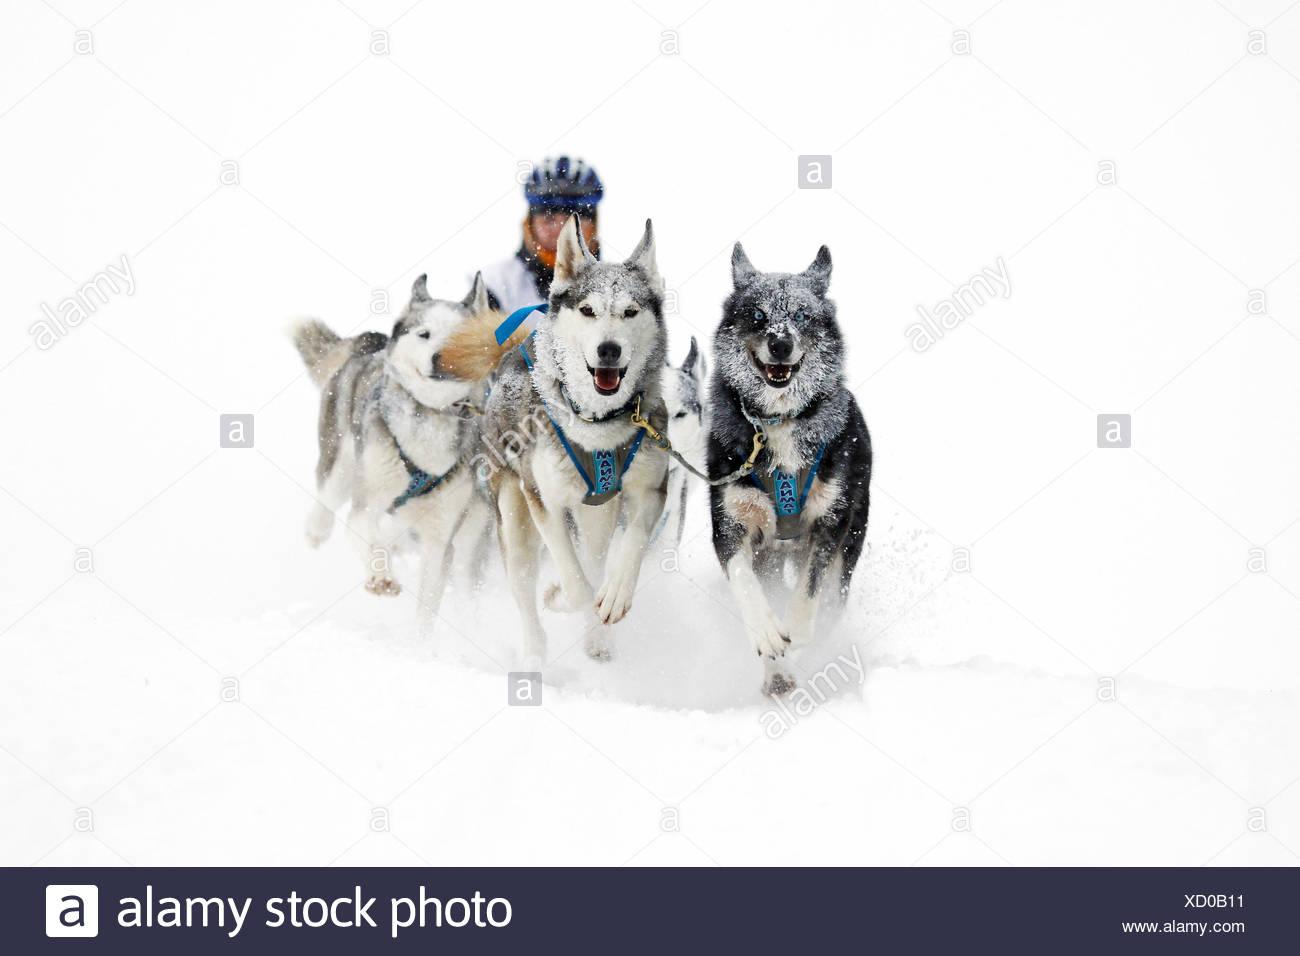 Alpine Trail Sled Dog Race 2013, Huskies, Prato Piazza alpine meadow, Fanes-Sennes-Prags Nature Park, Prags, Dolomites Stock Photo